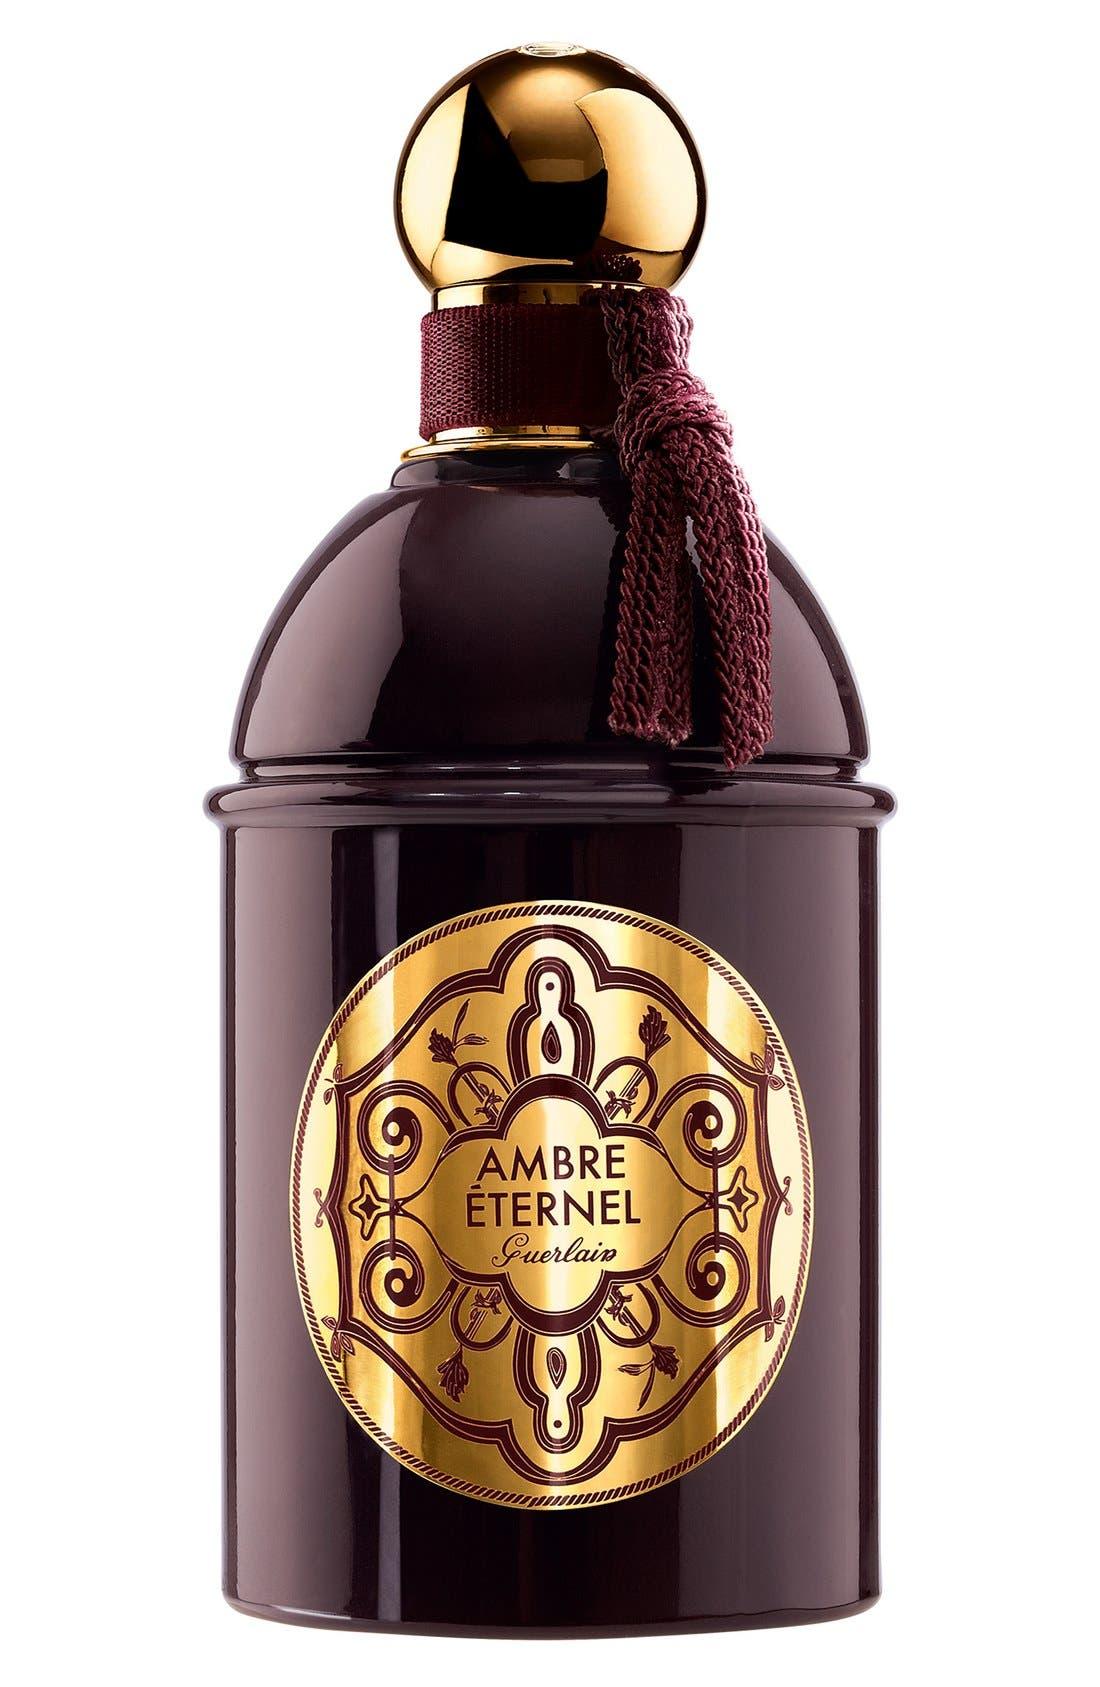 Guerlain 'Ambre Éternel' Fragrance